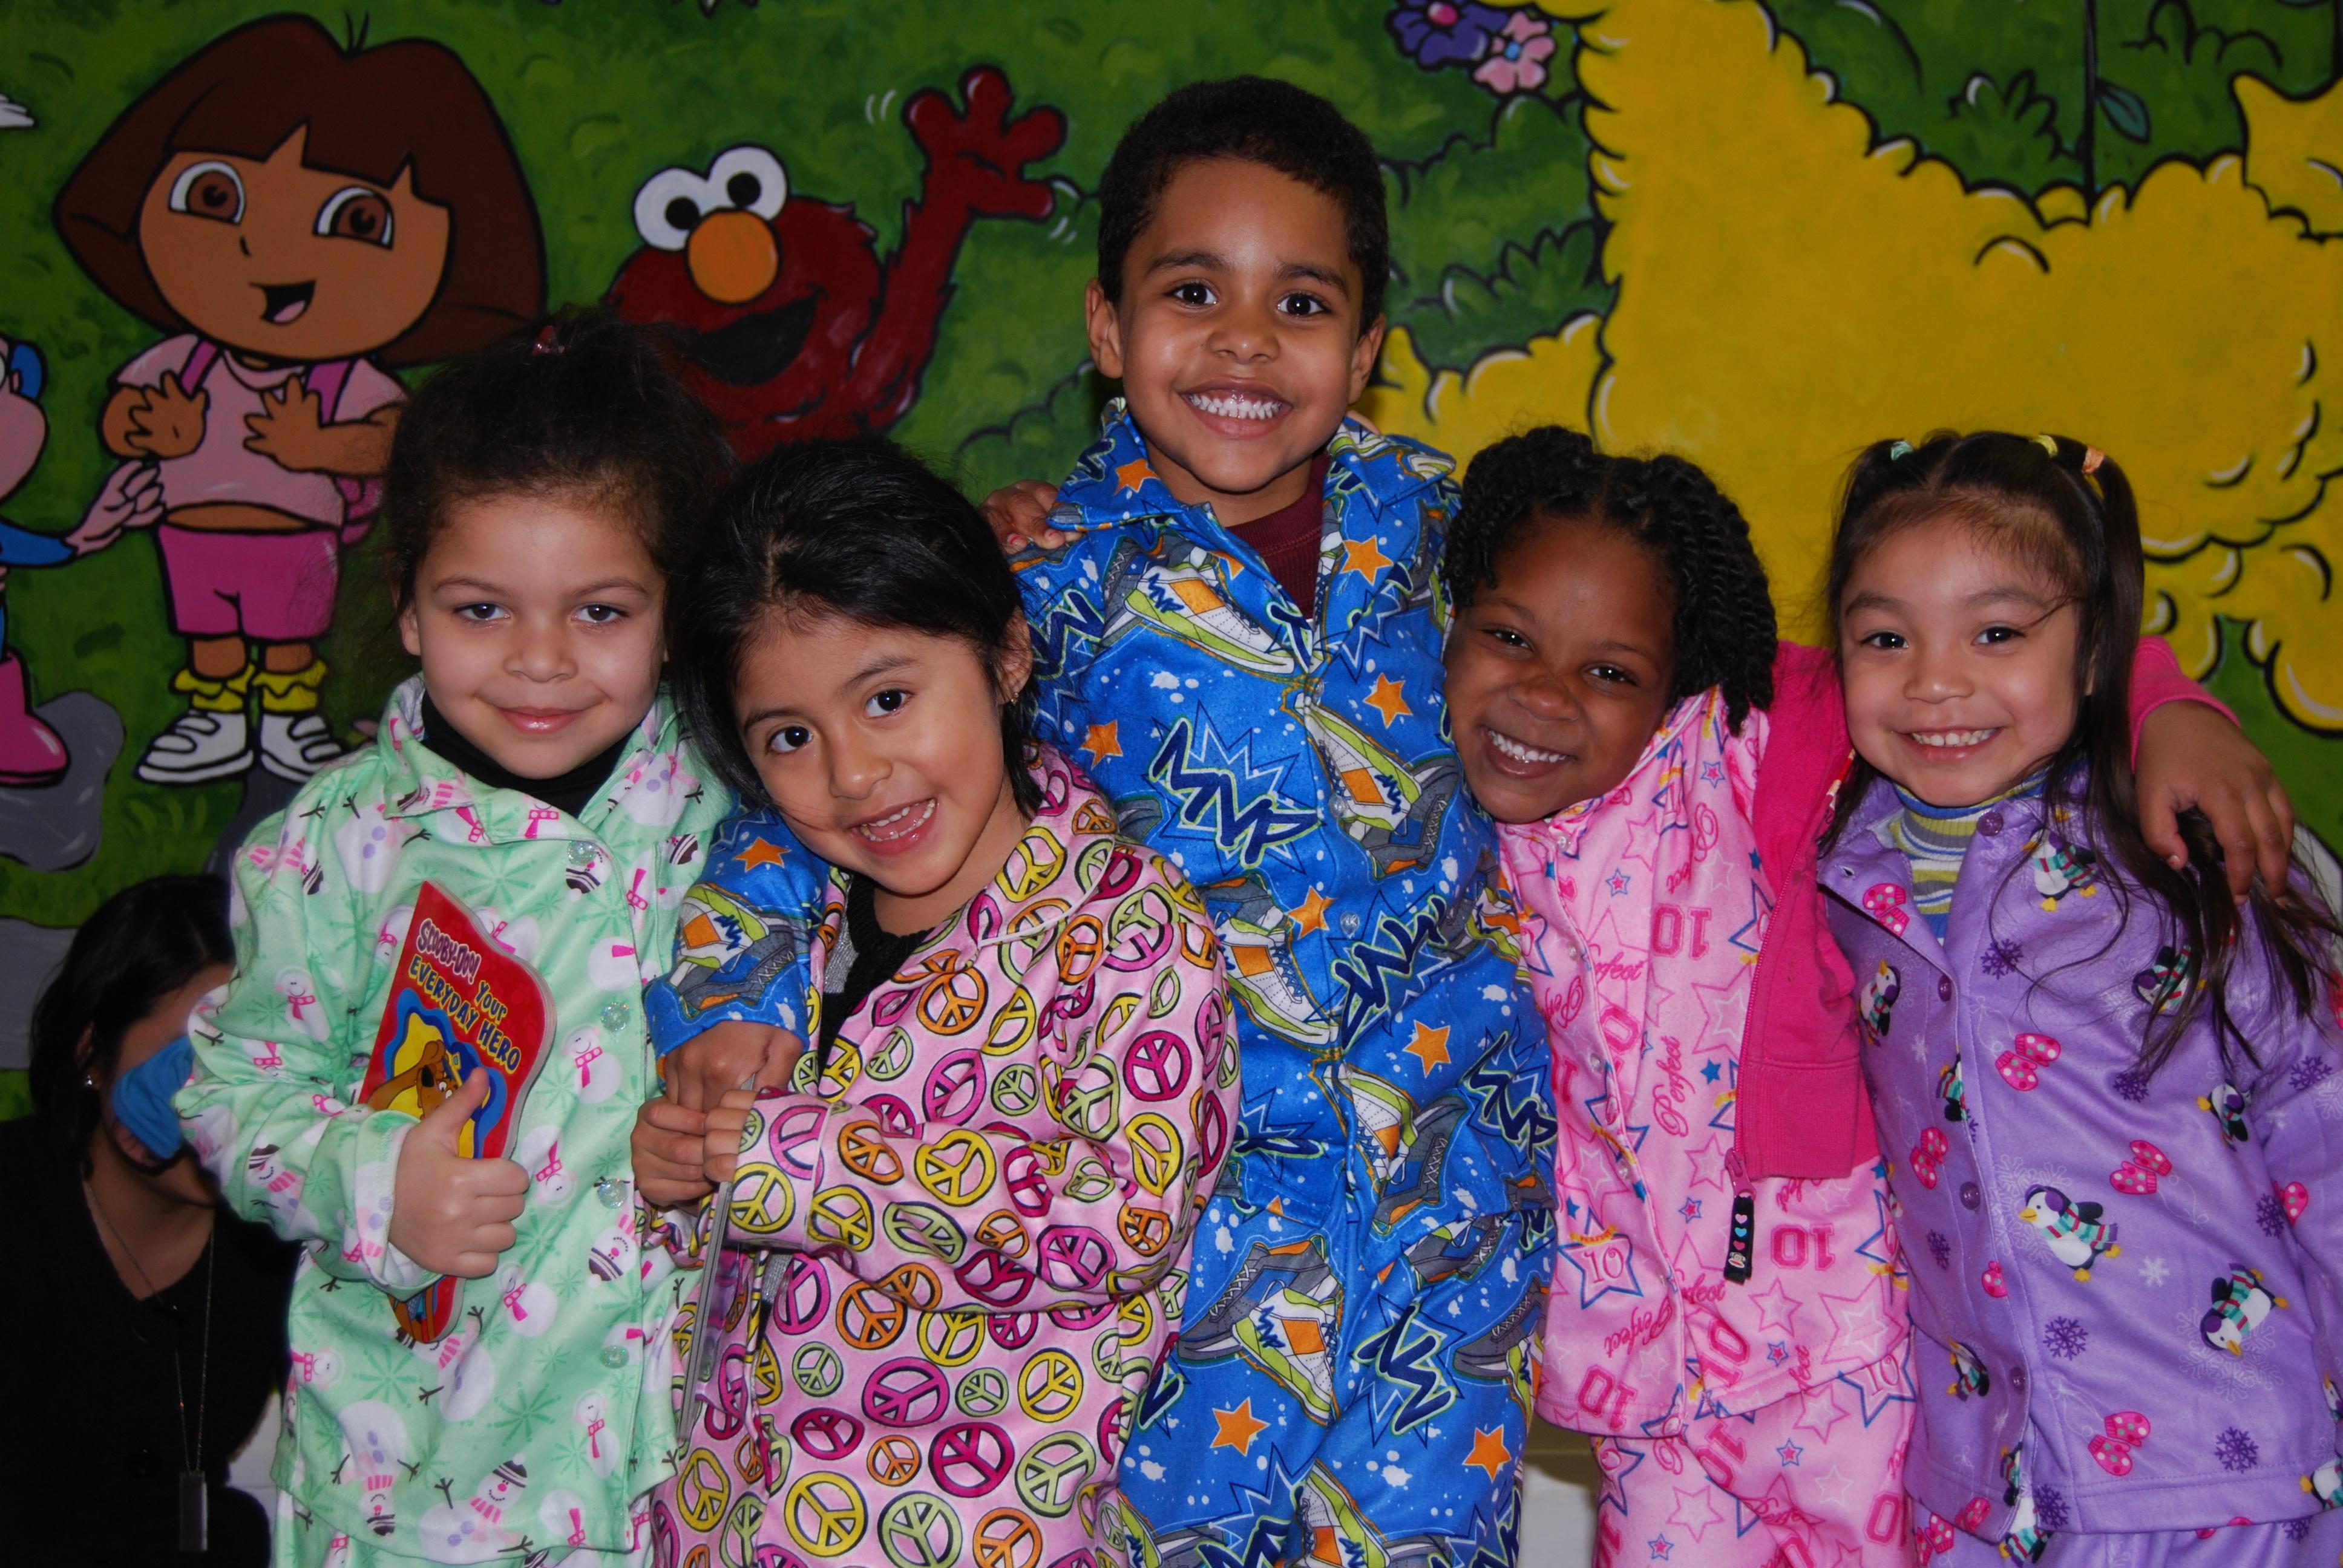 Milkshake Kids | Good Finds That Give Back | The Pajama Program